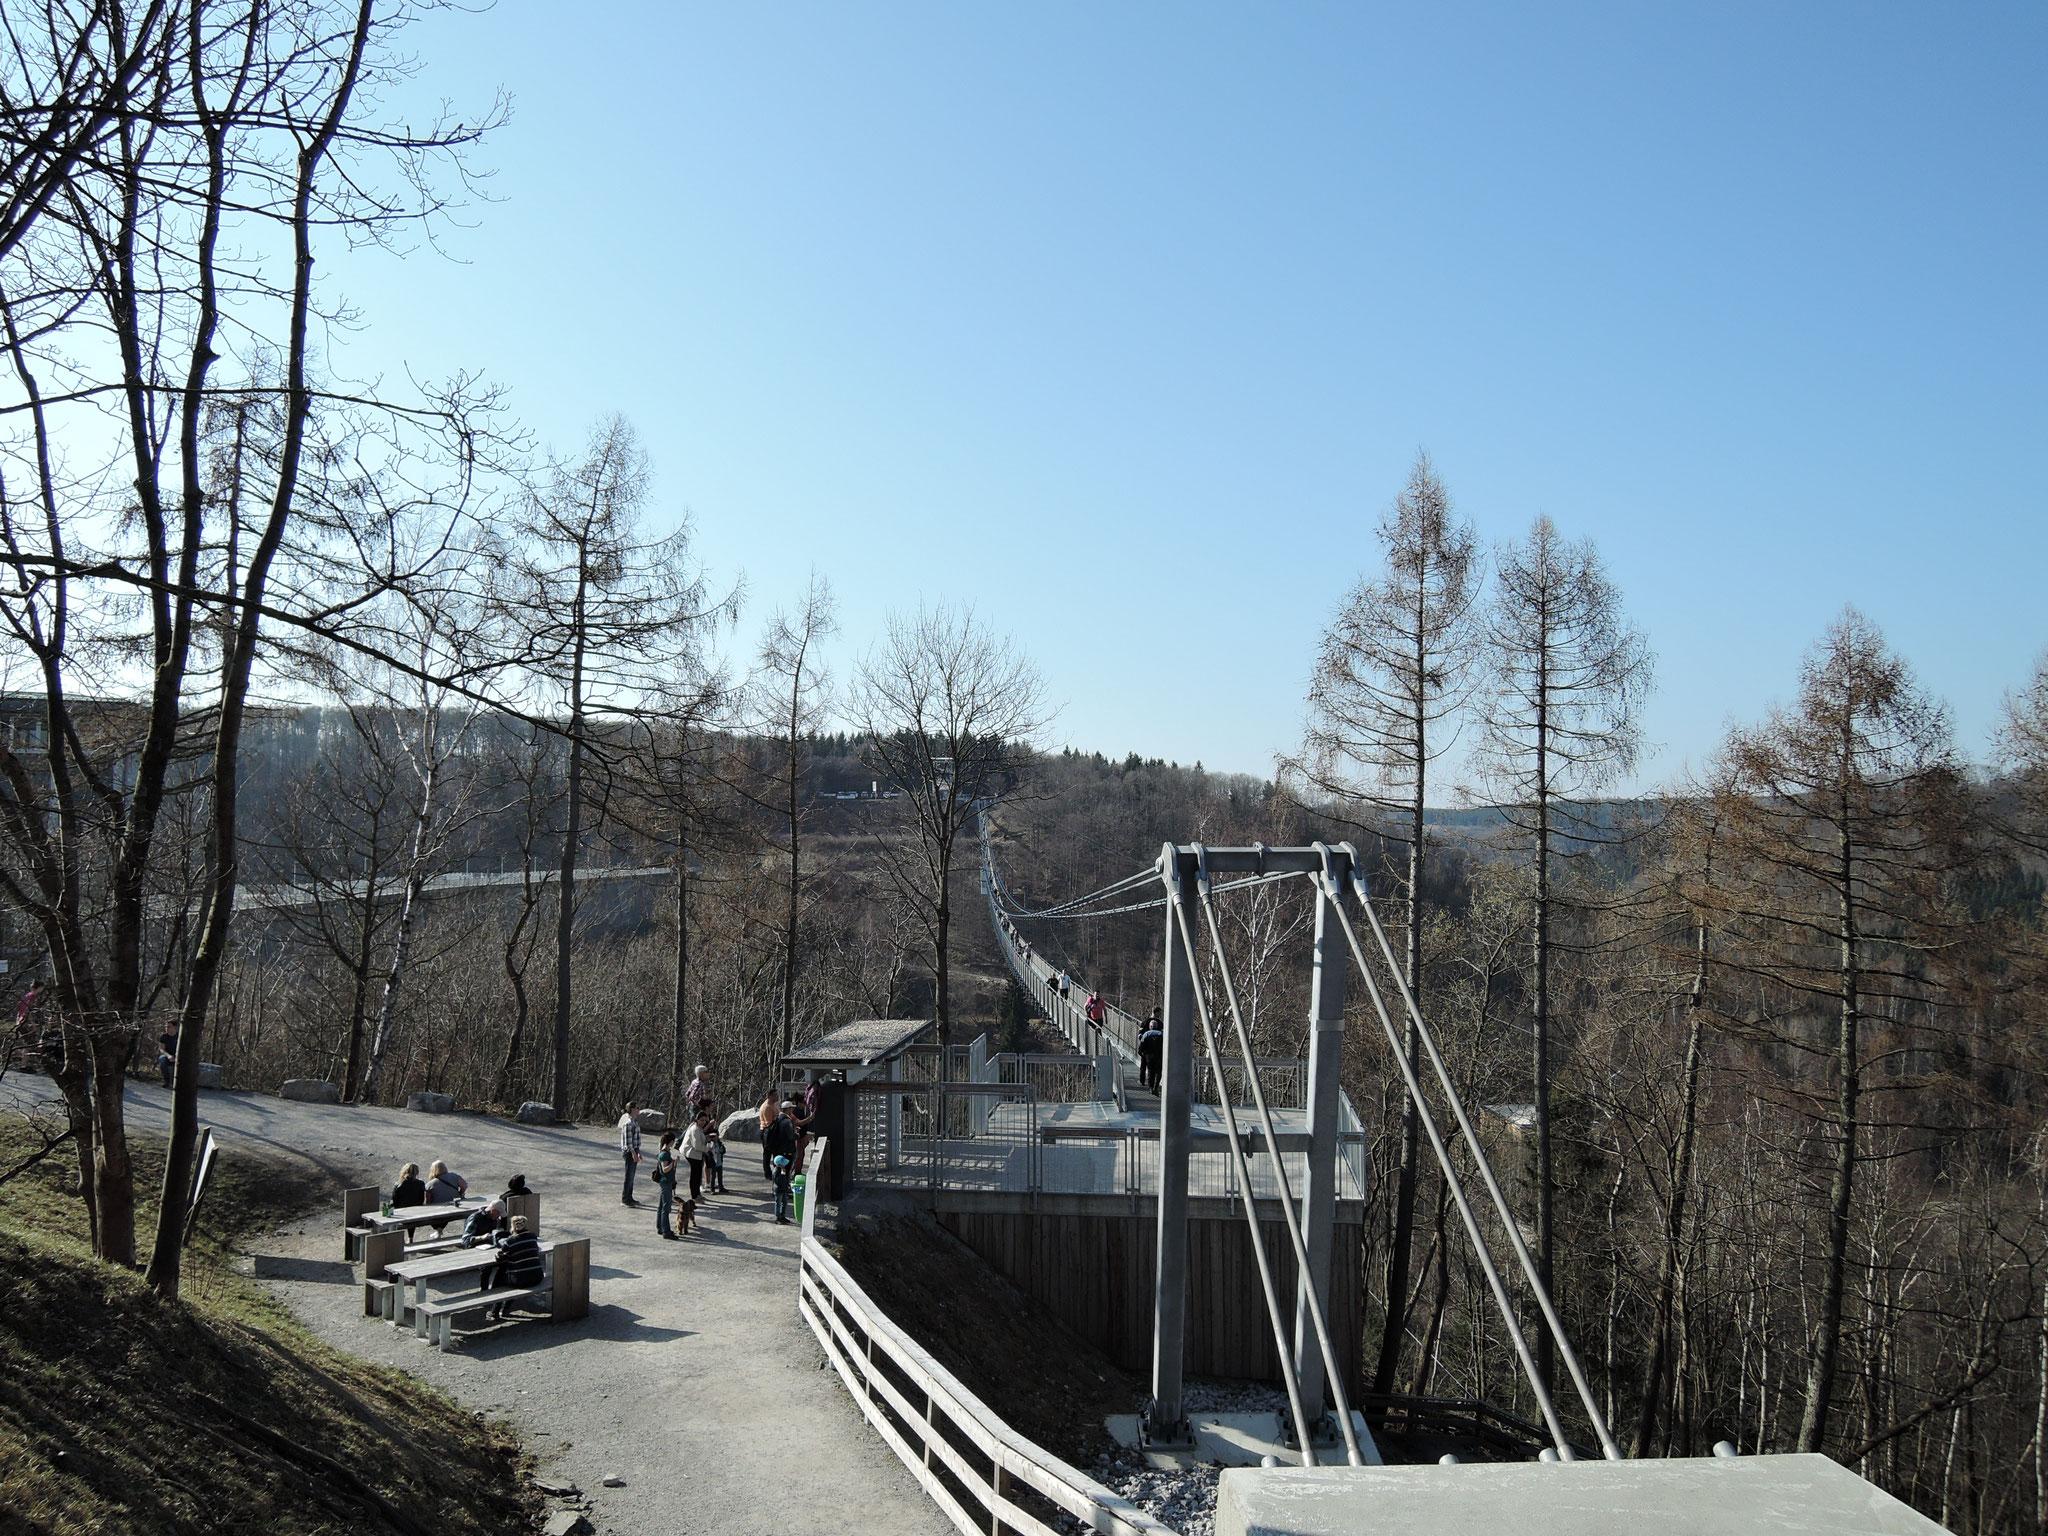 Seilhängebrücke 458m lang, ca. 9 km entfernt